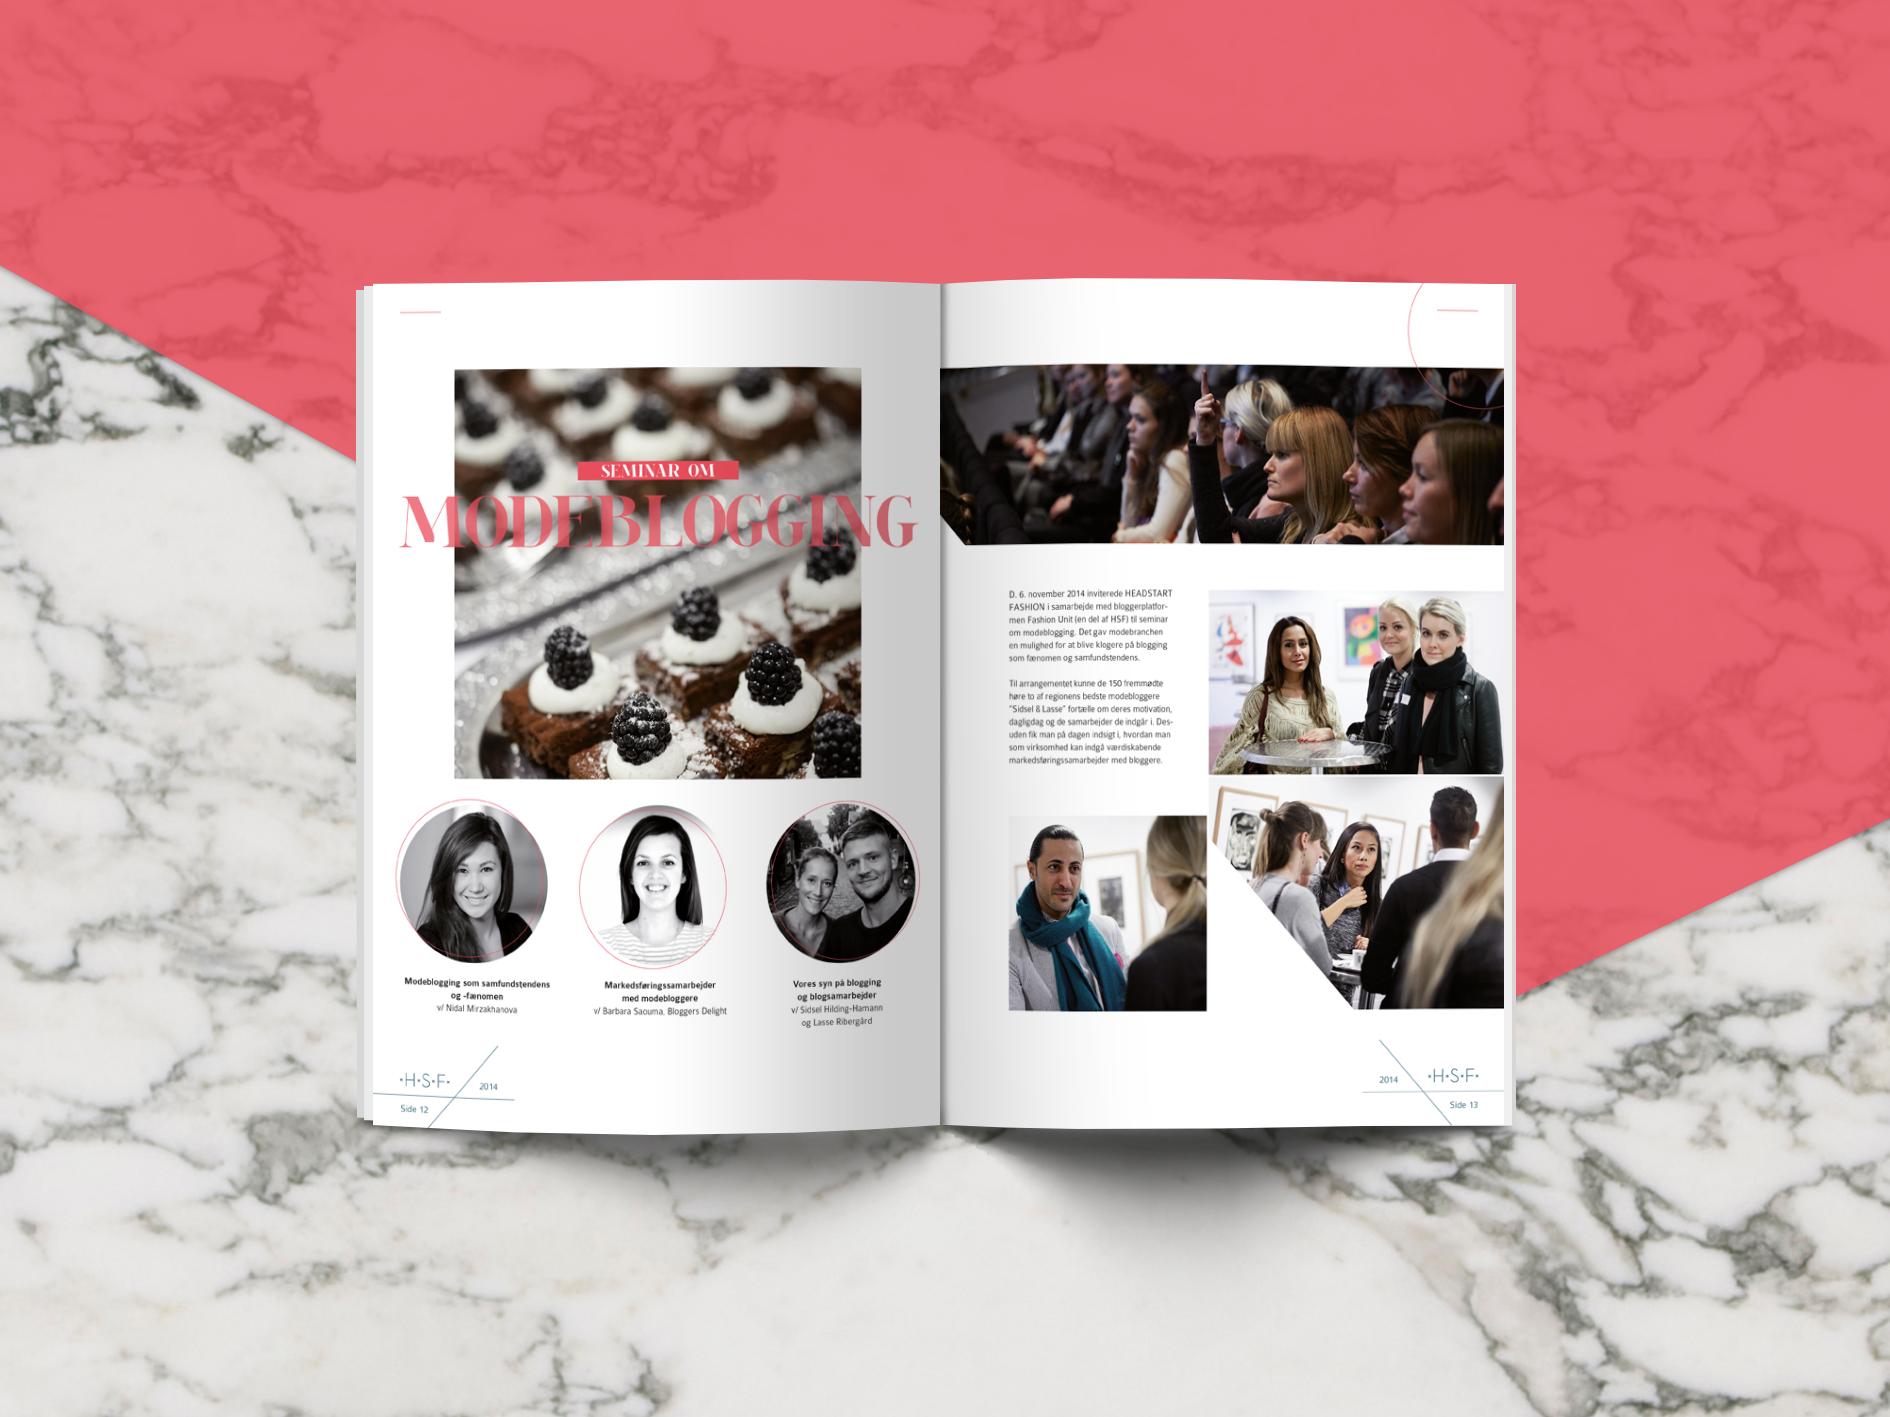 headstart_fashion_aarhus_magasin_grafiskdesign_krims_aarhus_maria_refsgaard_03